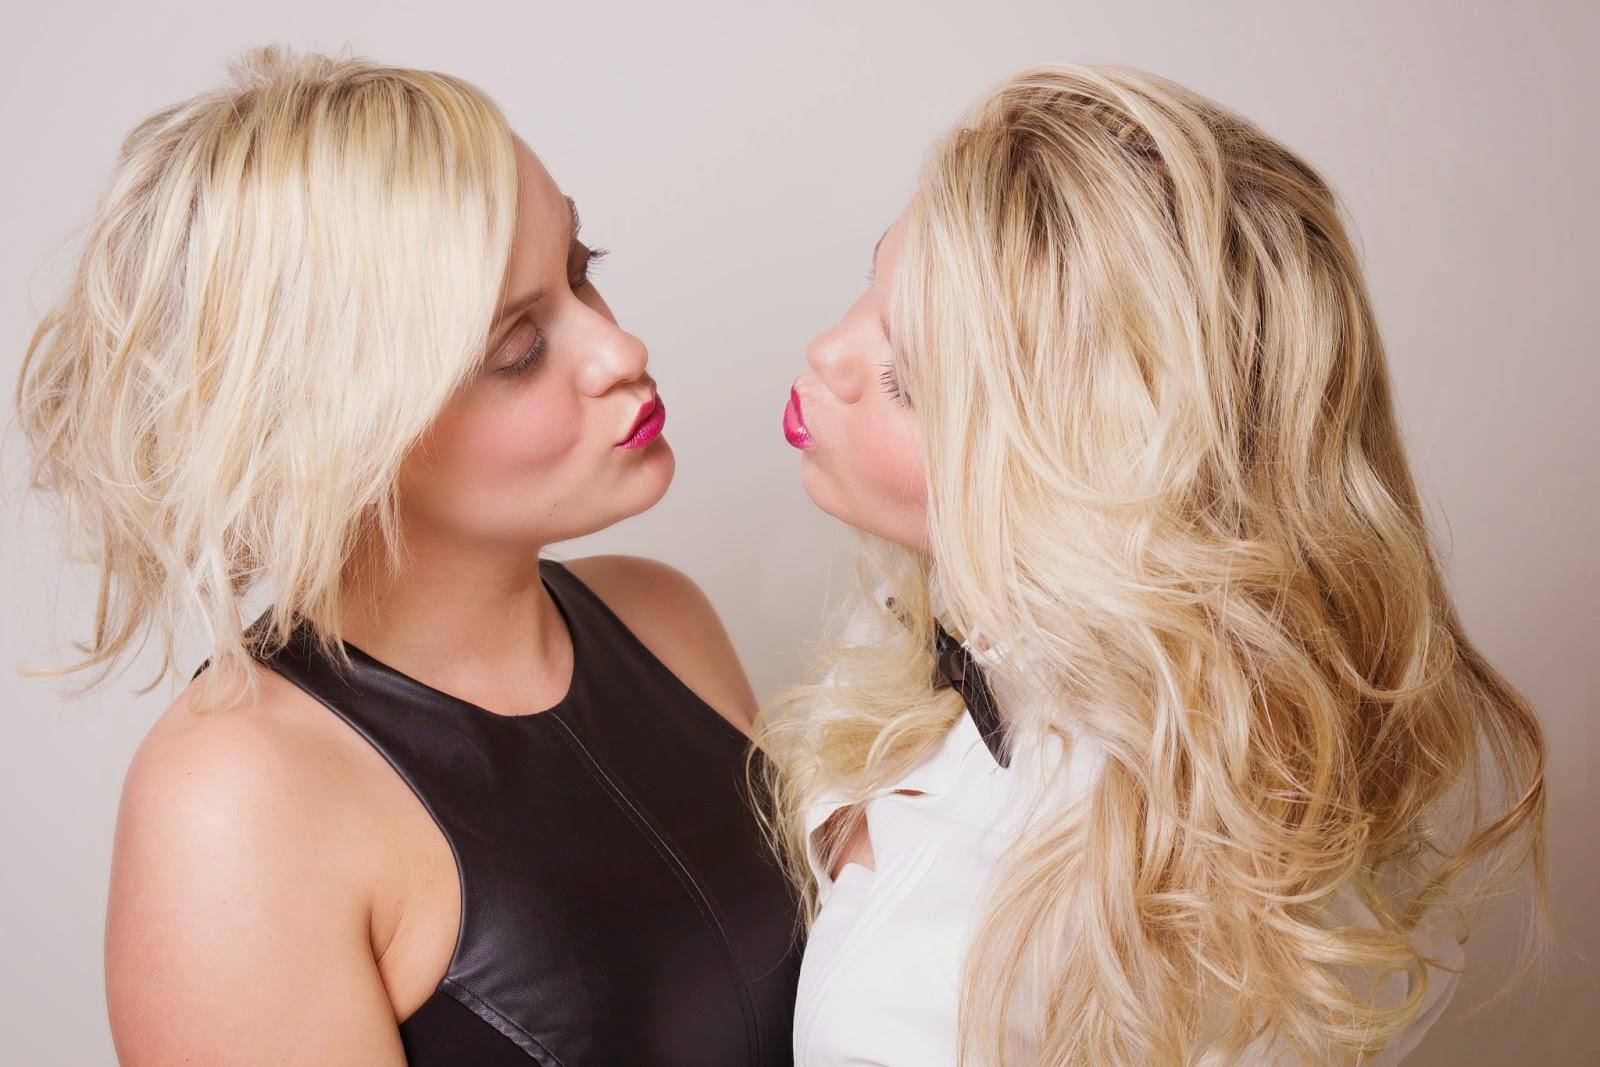 7 dating tips for older singles Kalundborg